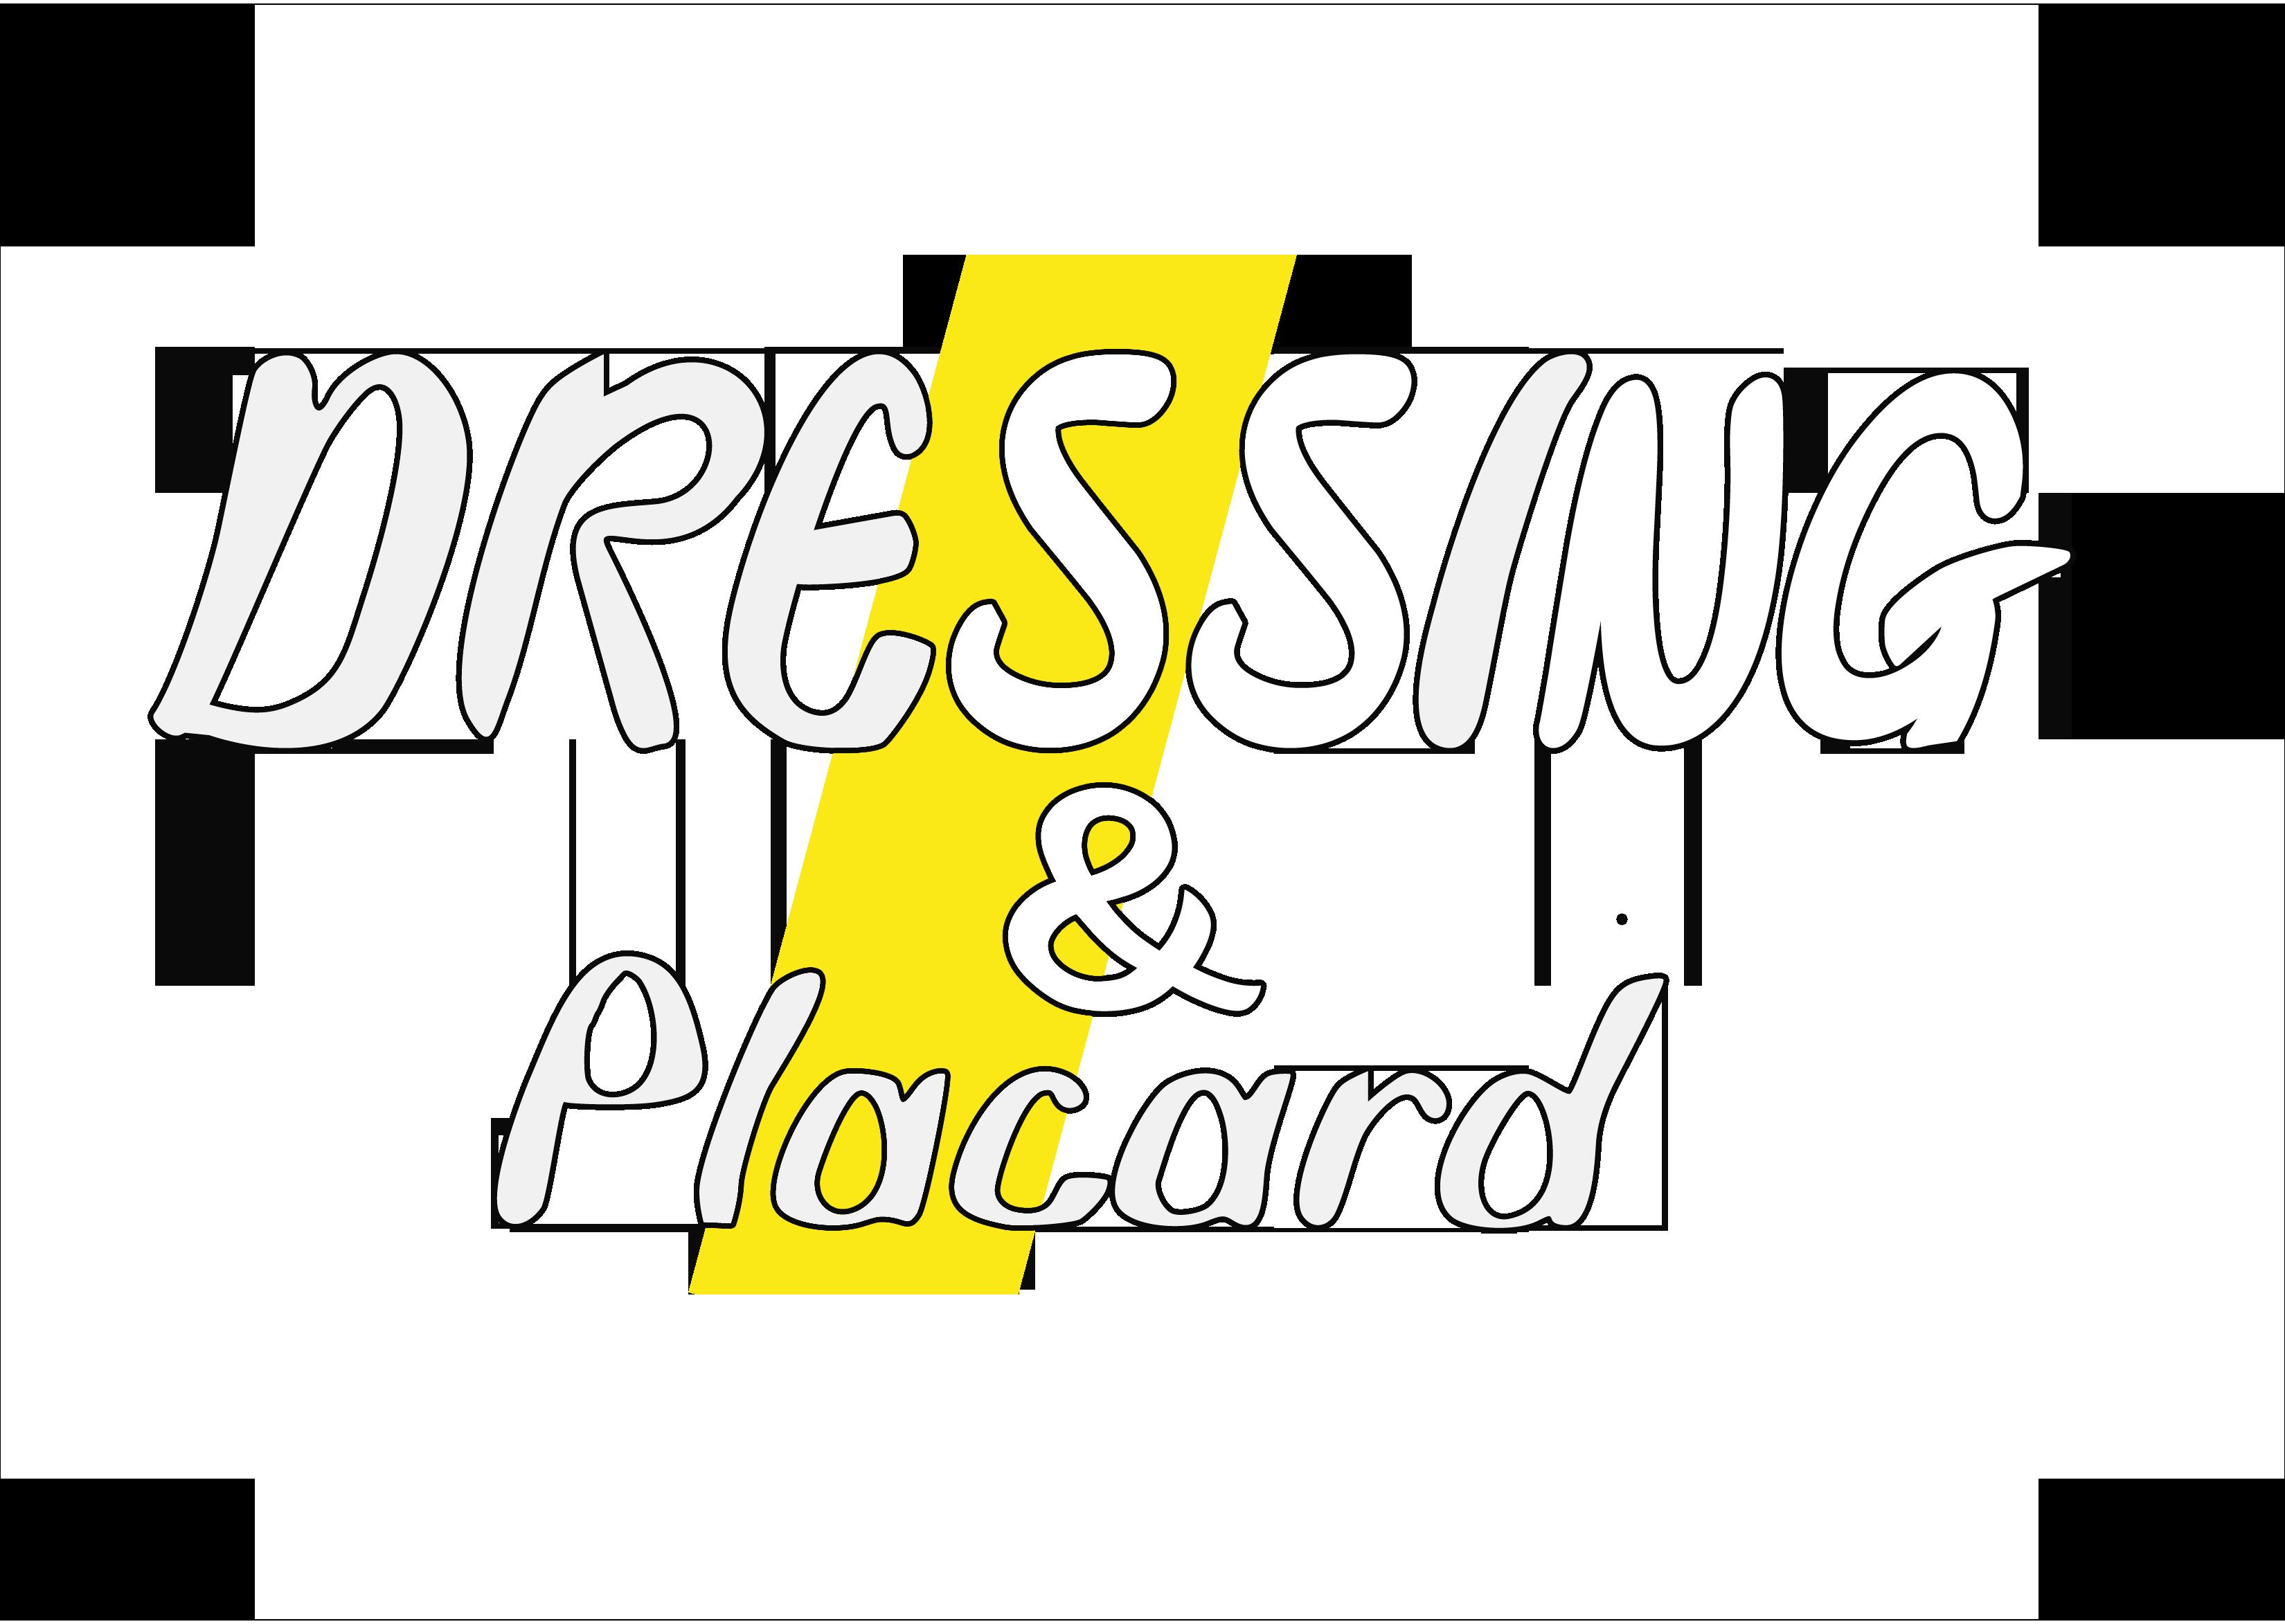 Dressing et Placard